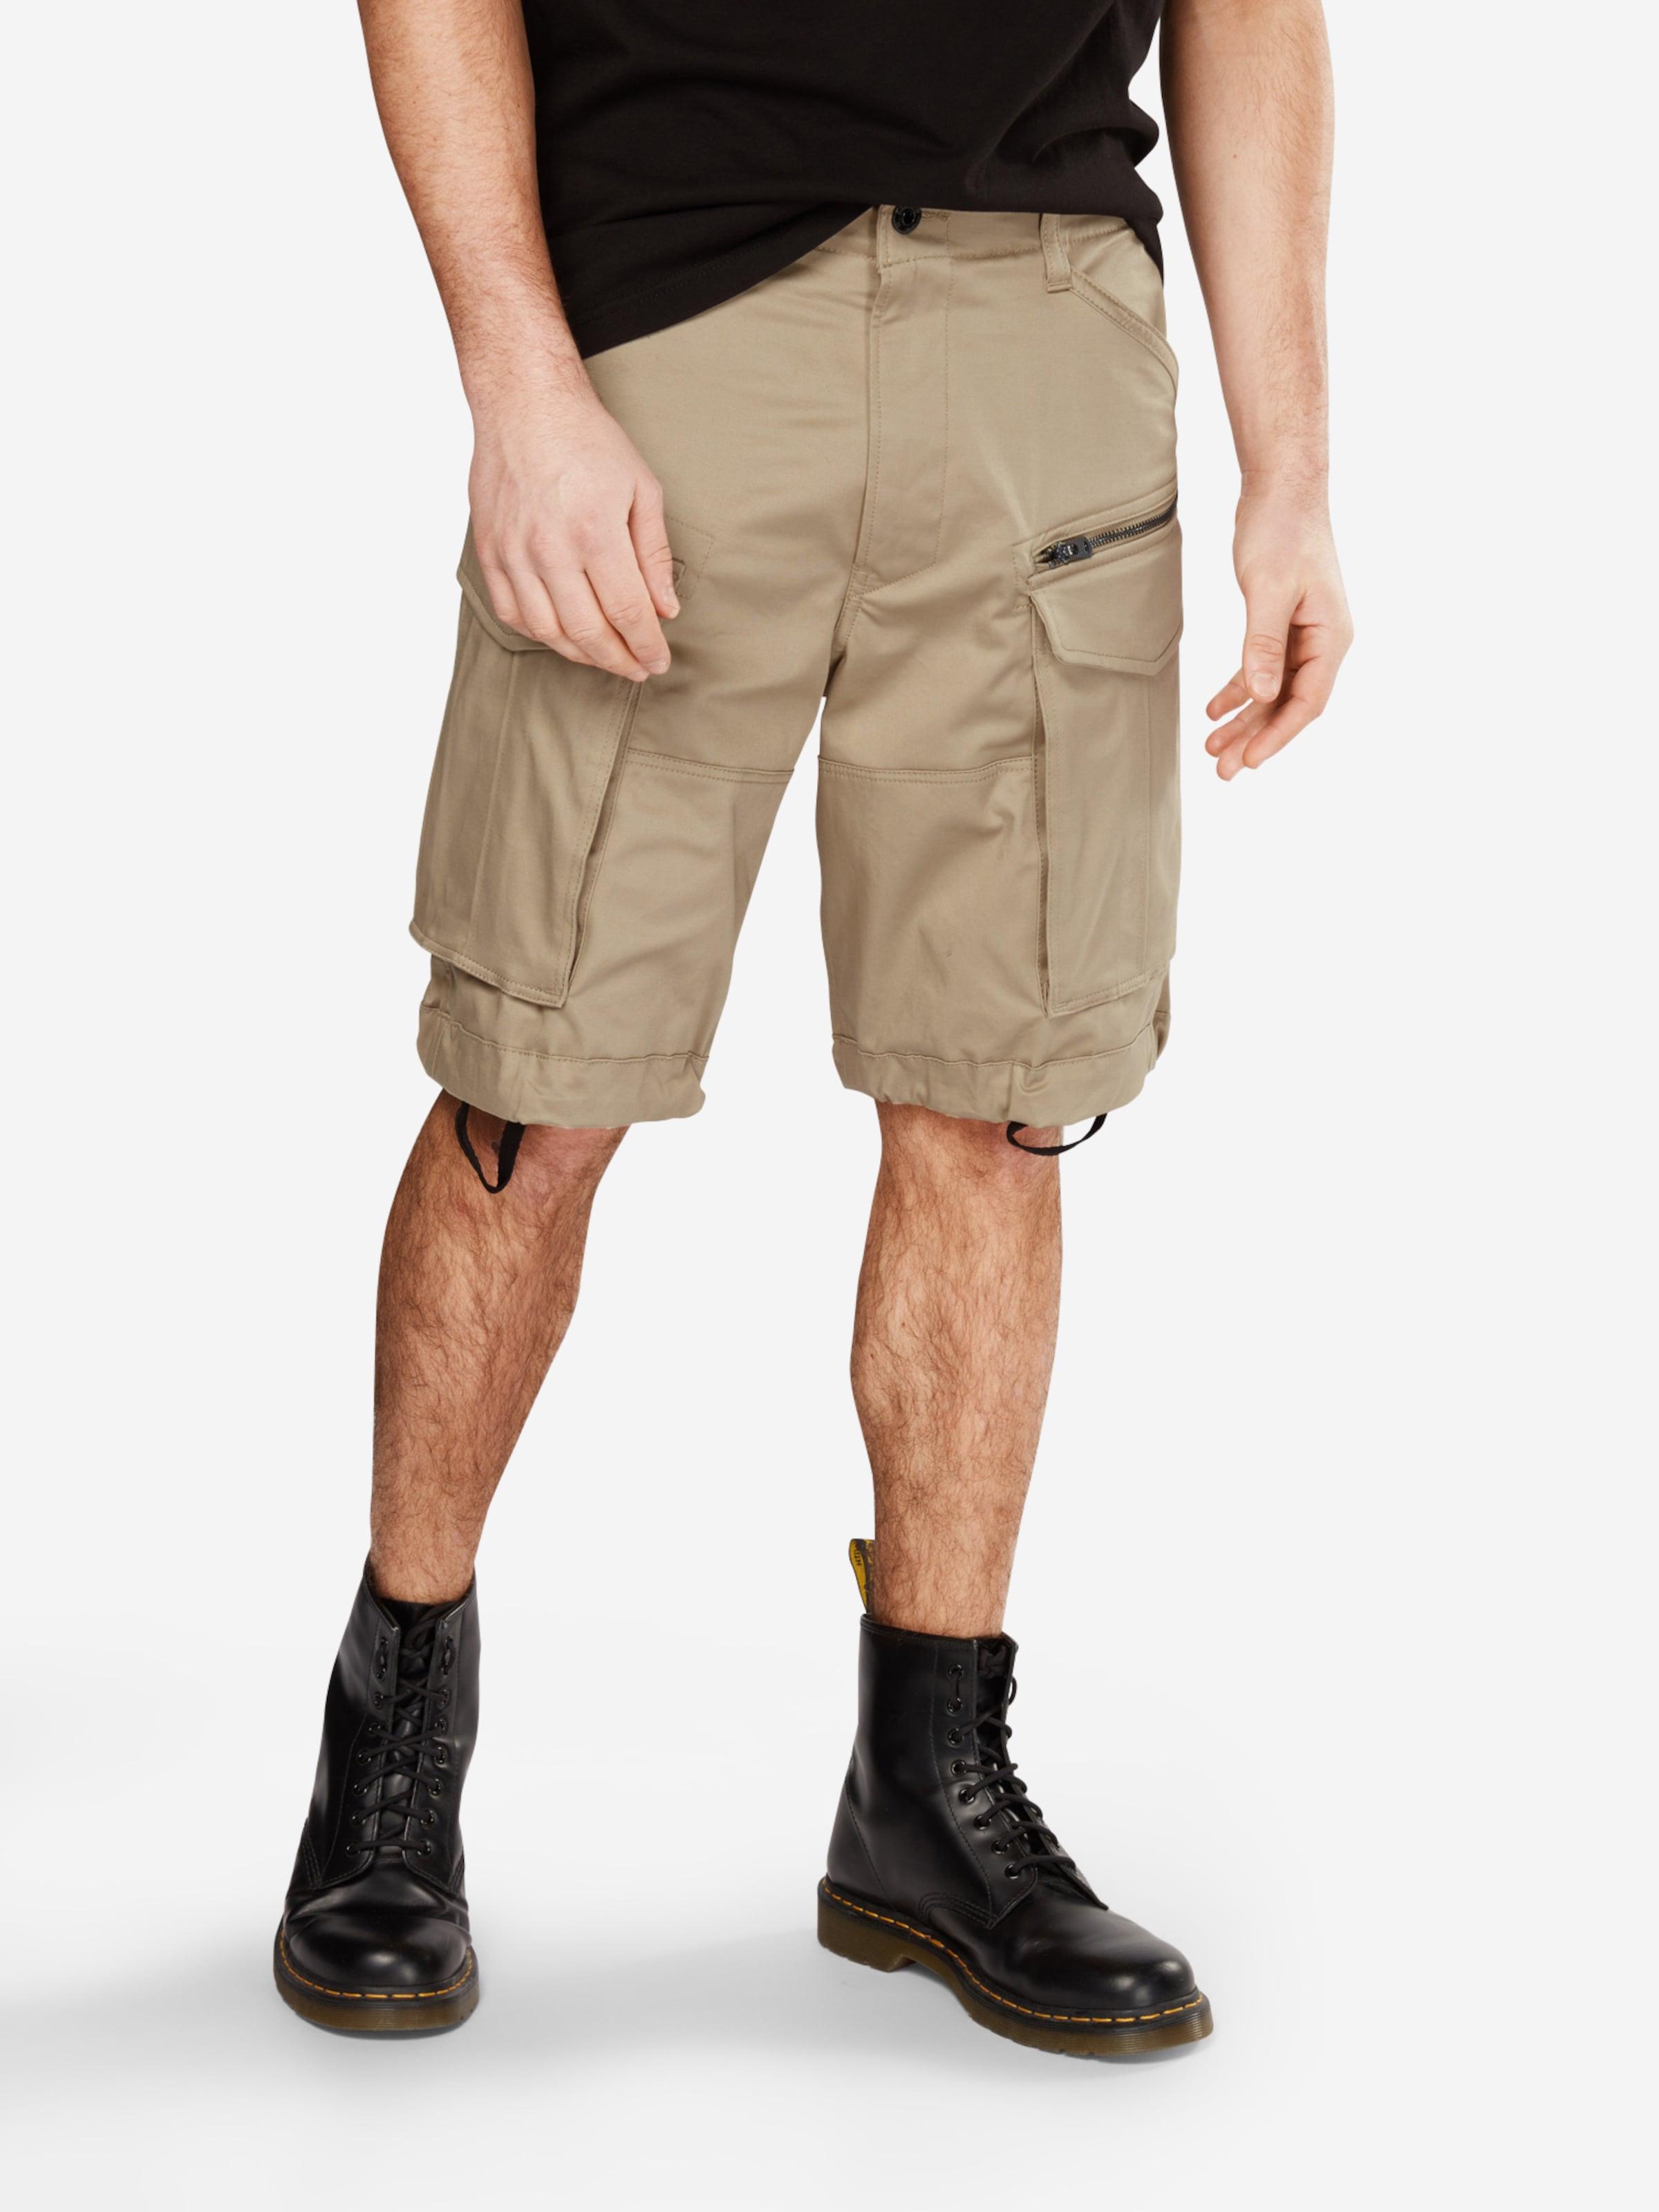 Erstaunlicher Preis G-STAR RAW Shorts 'Rovic' Billig viKLZ